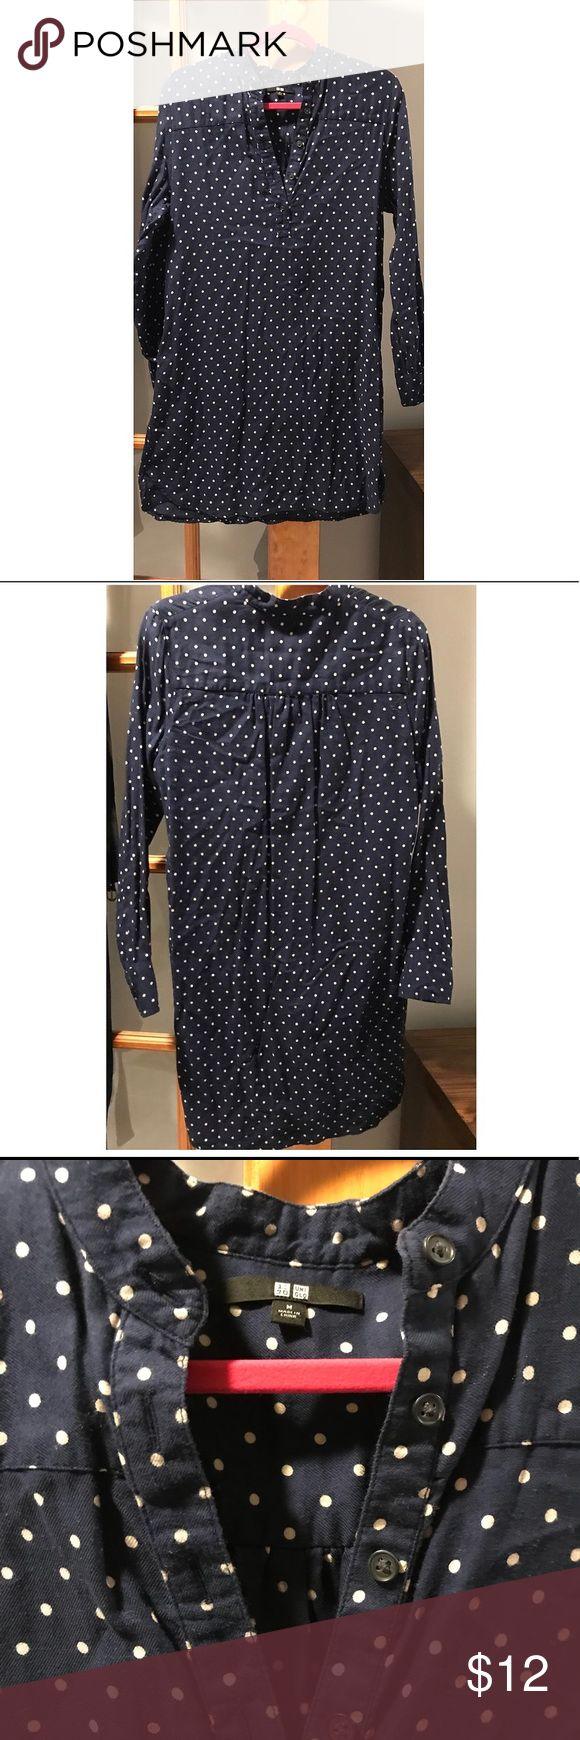 Long sleeve dress Navy blue and polka dot long sleeve dress Uniqlo Dresses Midi